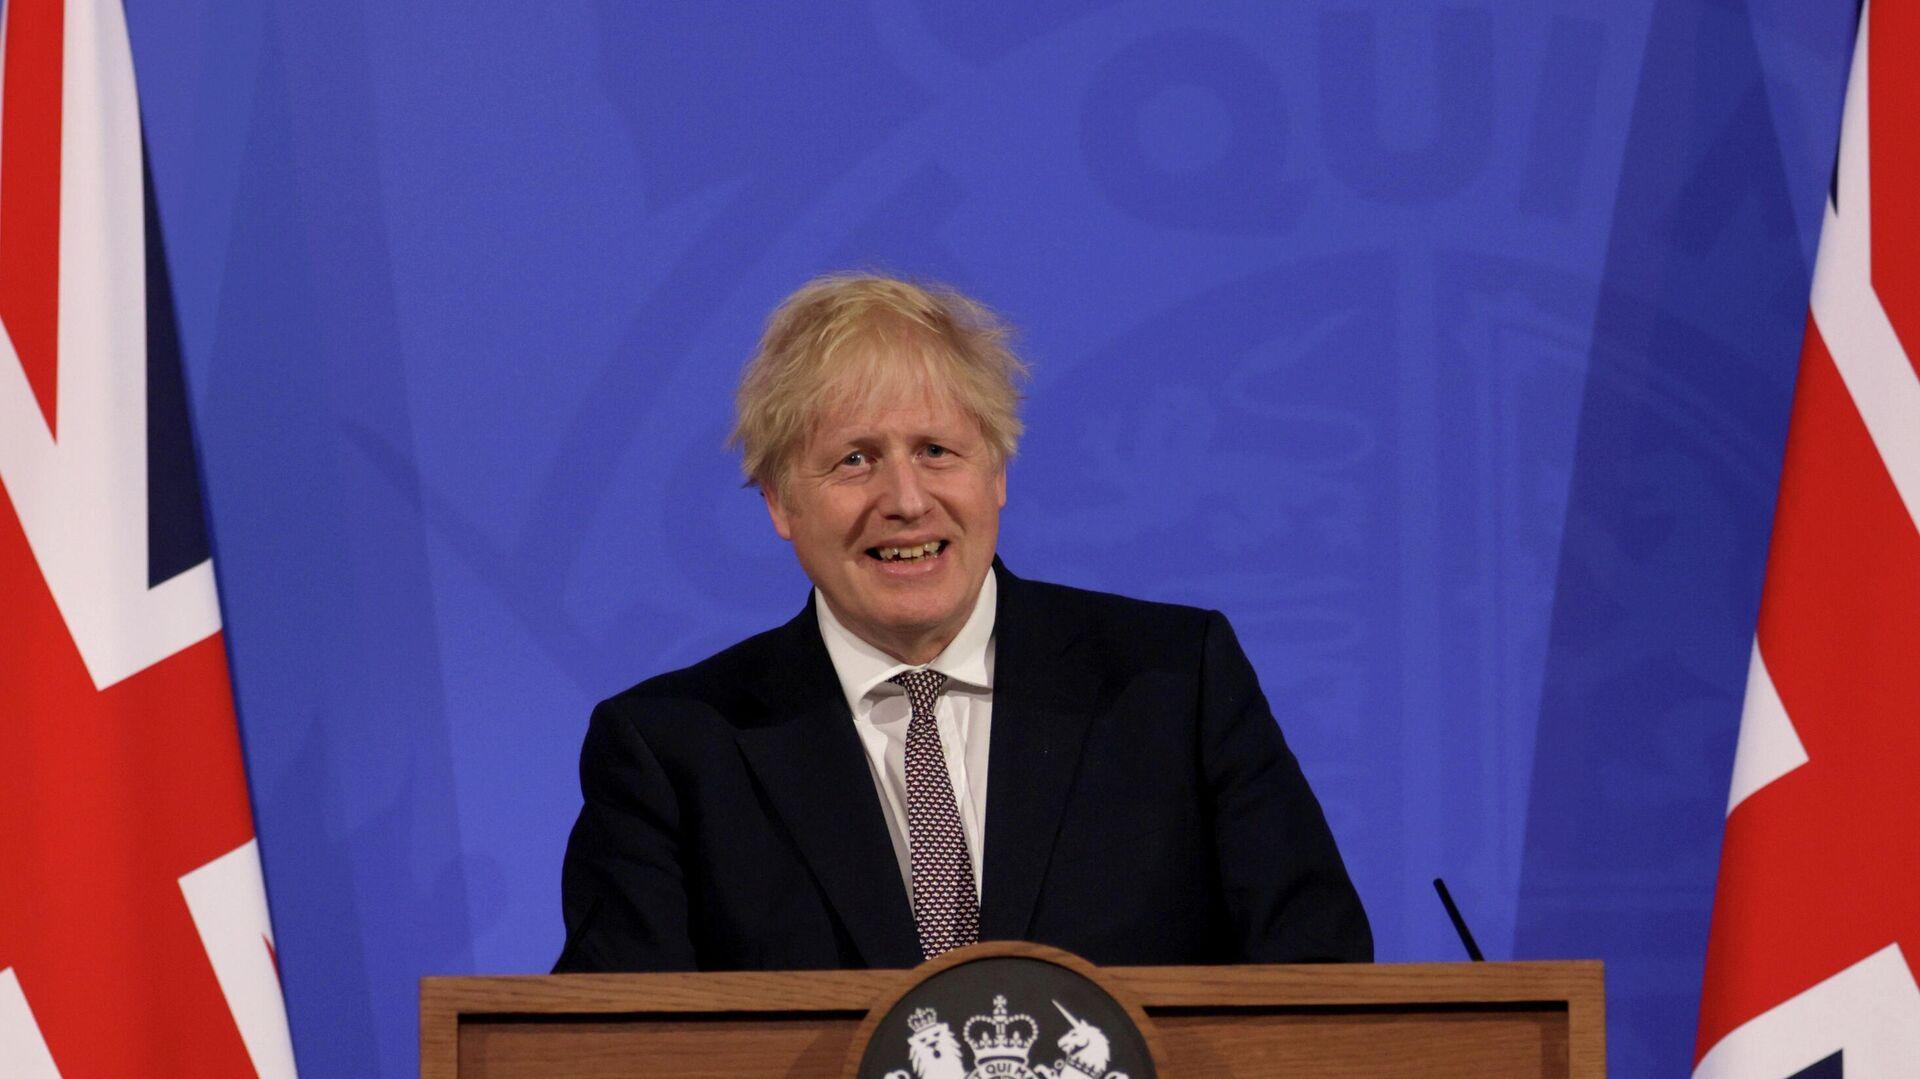 Boris Johnson, primer ministro del Reino Unido - Sputnik Mundo, 1920, 02.06.2021